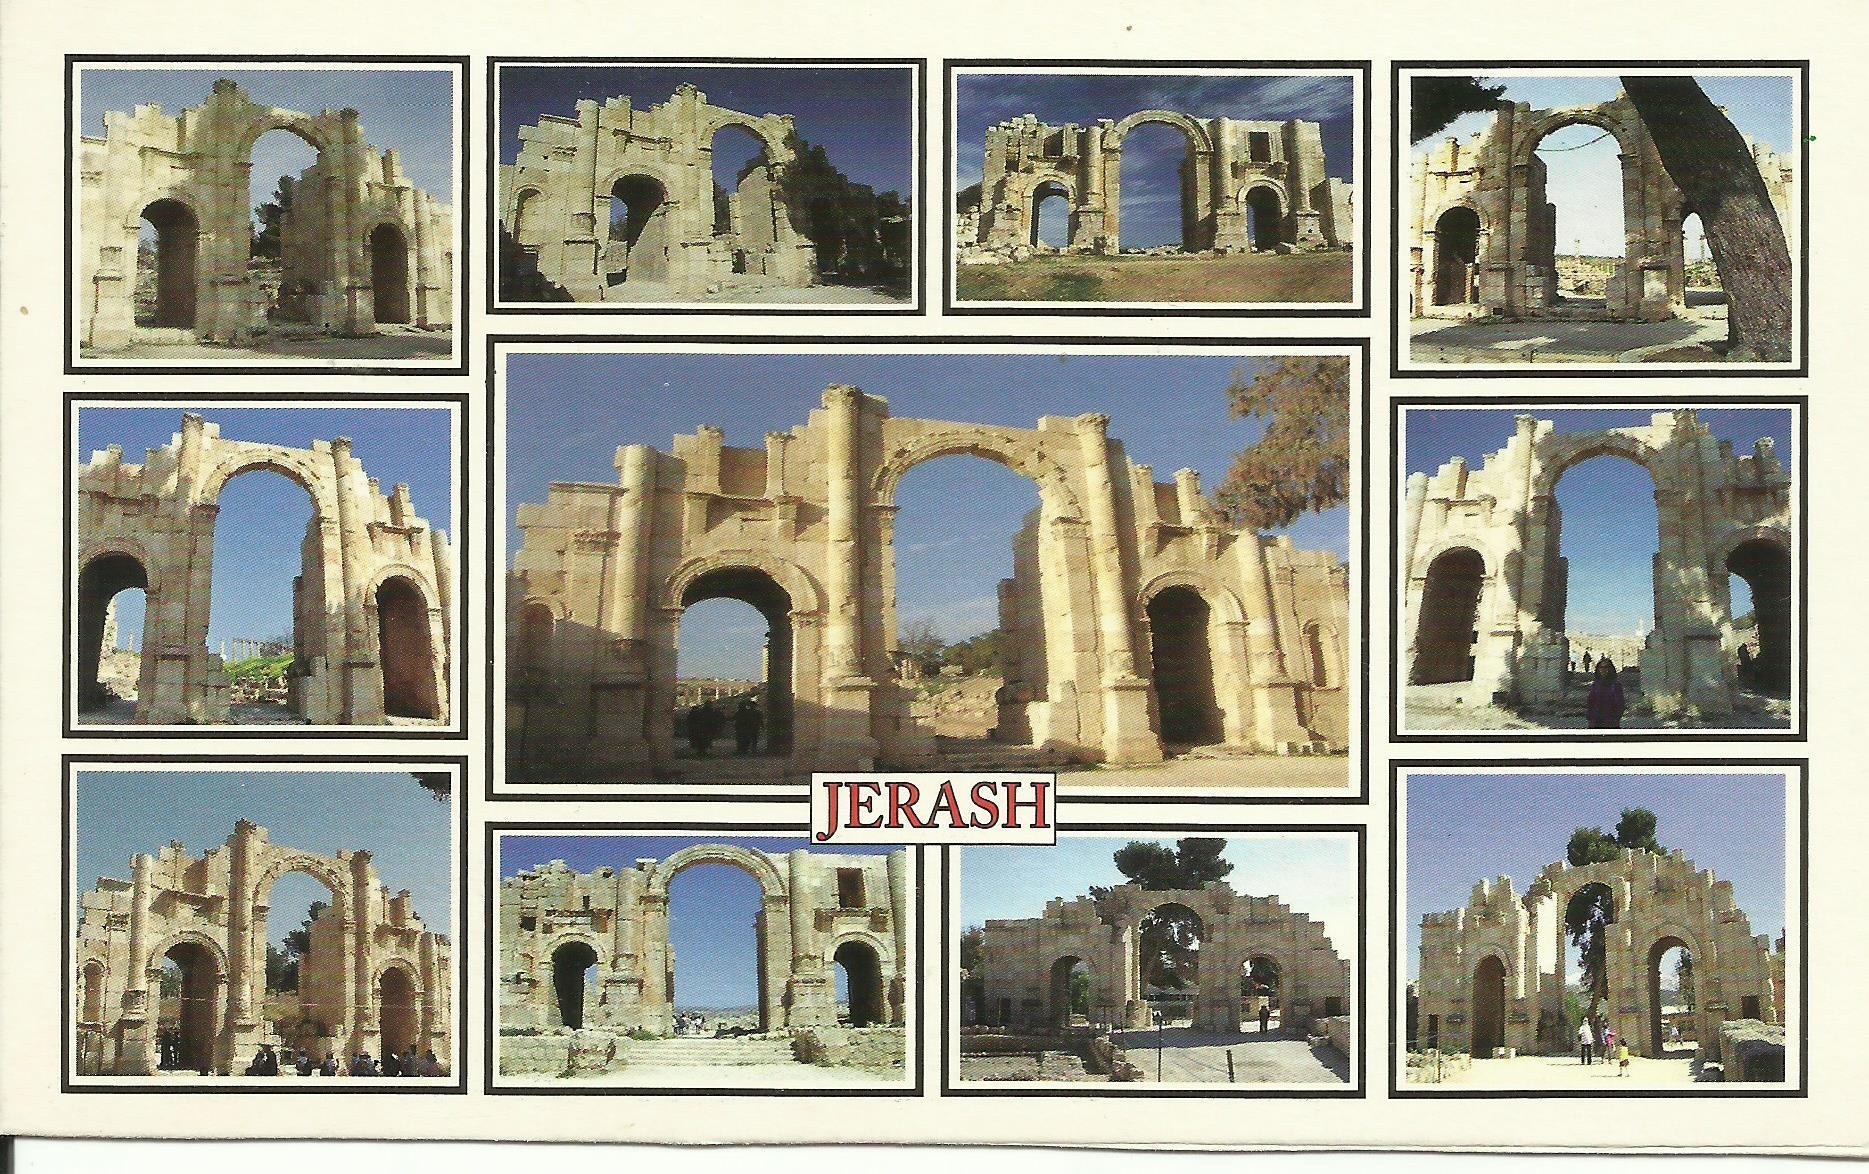 Jerash, Jordan: Roman Ruins of Gerasa